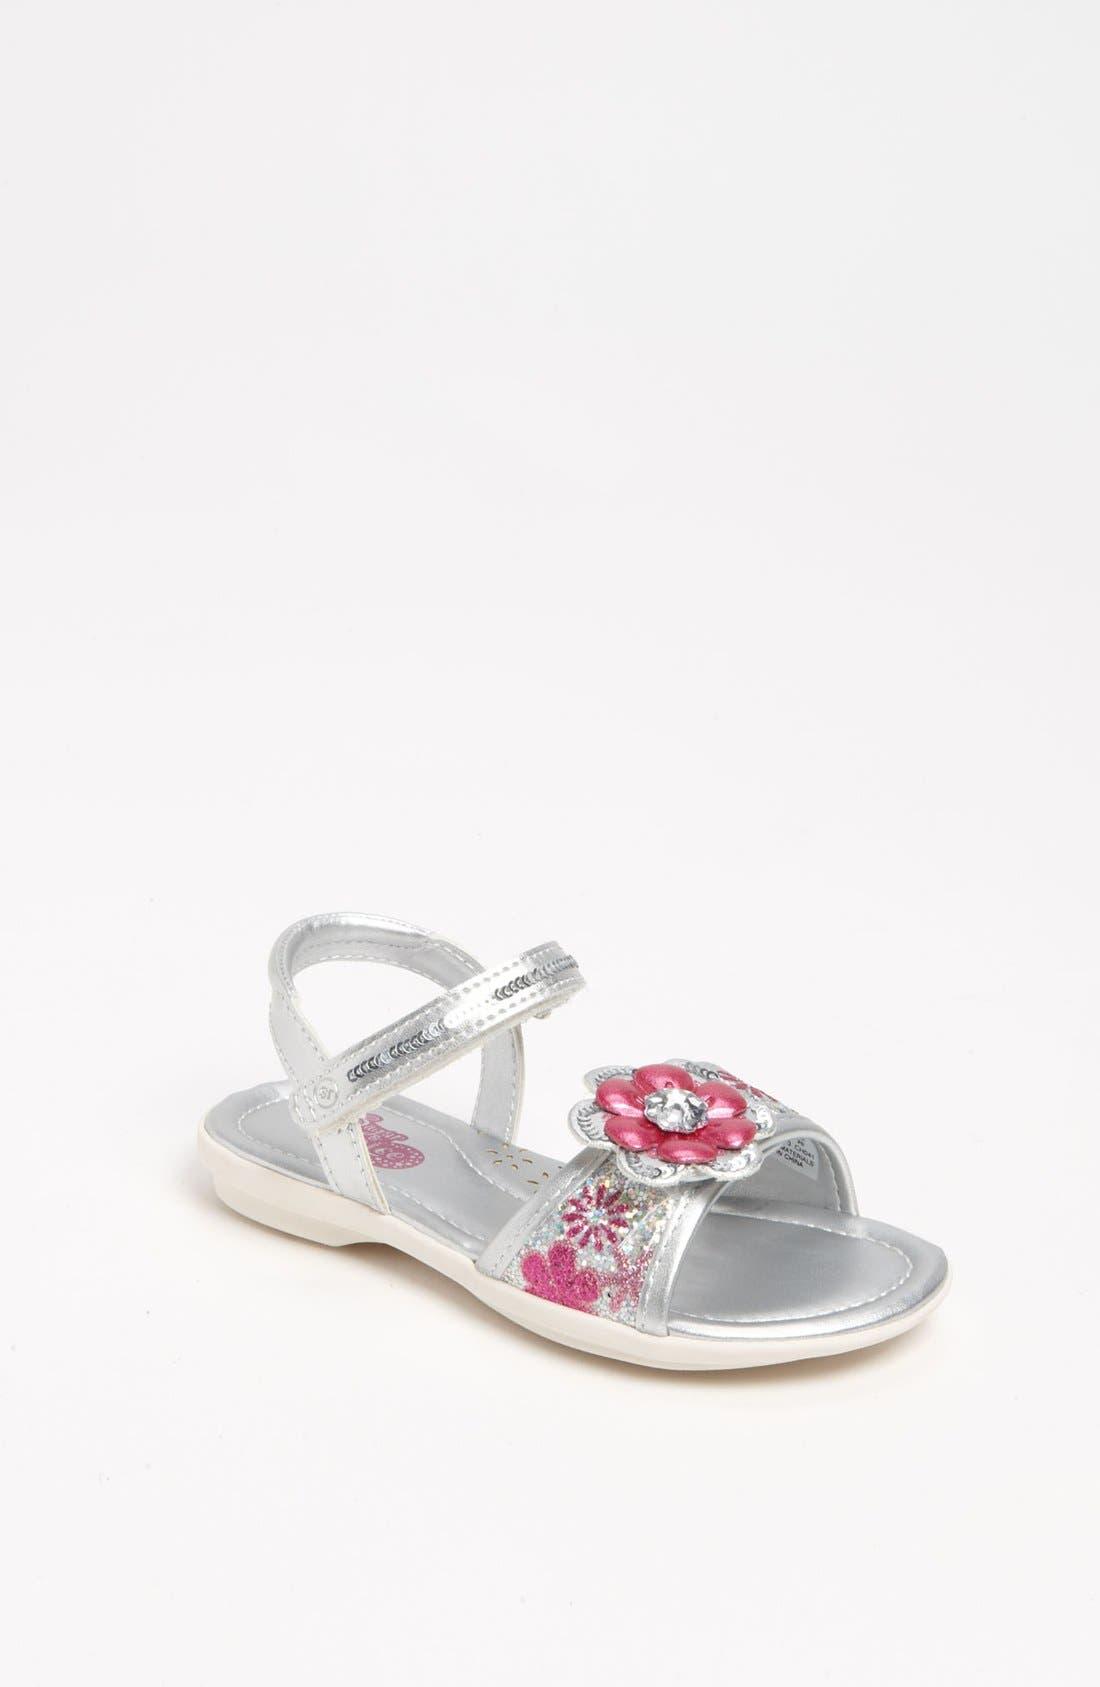 Alternate Image 1 Selected - Stride Rite 'Electra' Sandal (Toddler)